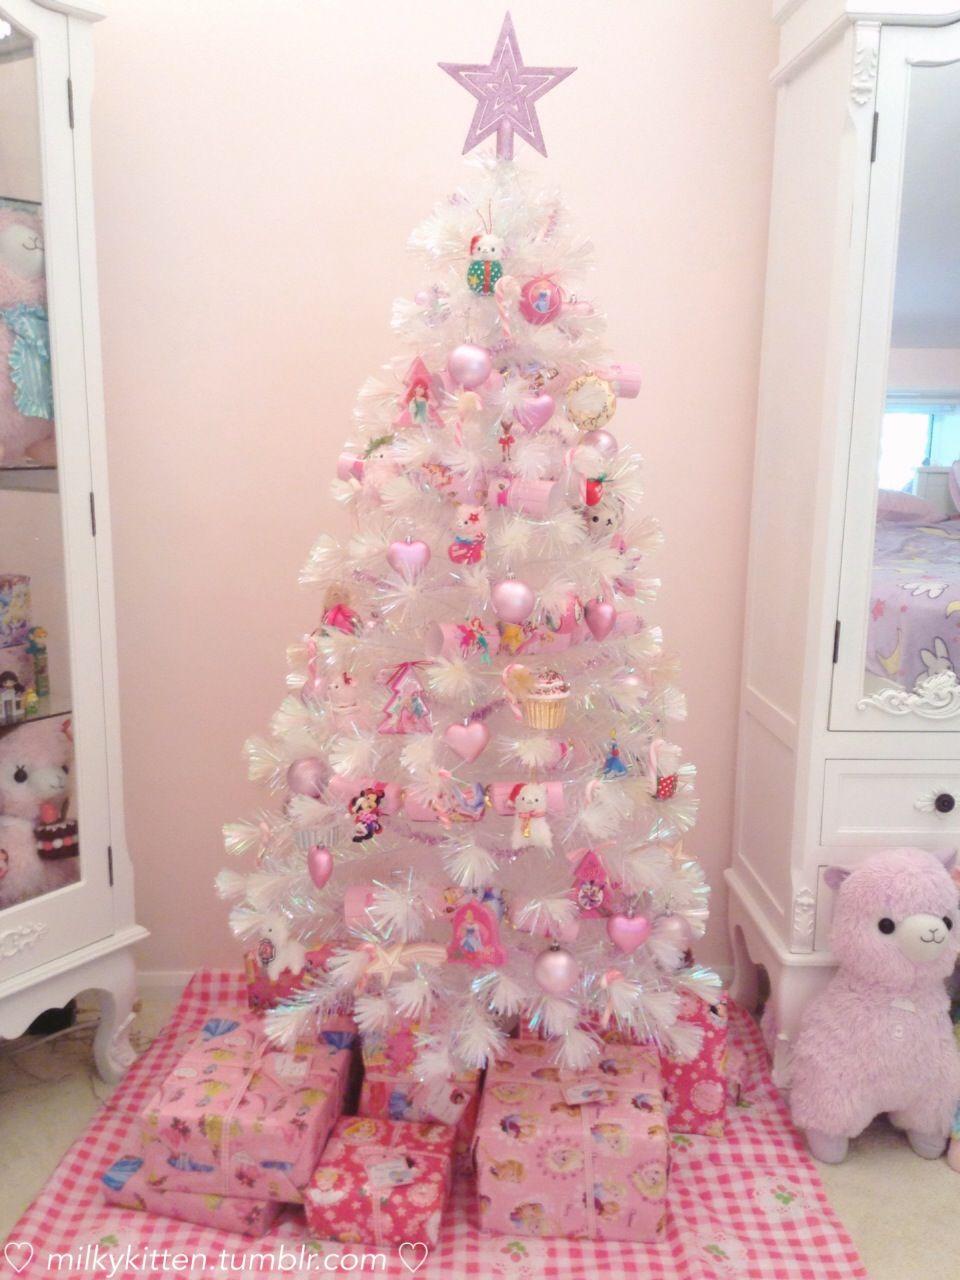 "milkykitten: "" It's beginning to look a lot like Christmasss~♪♡♡ My room is the happiest place on earth right now ˚₊*(ˊॢo̶̶̷̤◡ुo̴̶̷̤ˋॢ)*₊˚⁎ ""  XMAS goals"